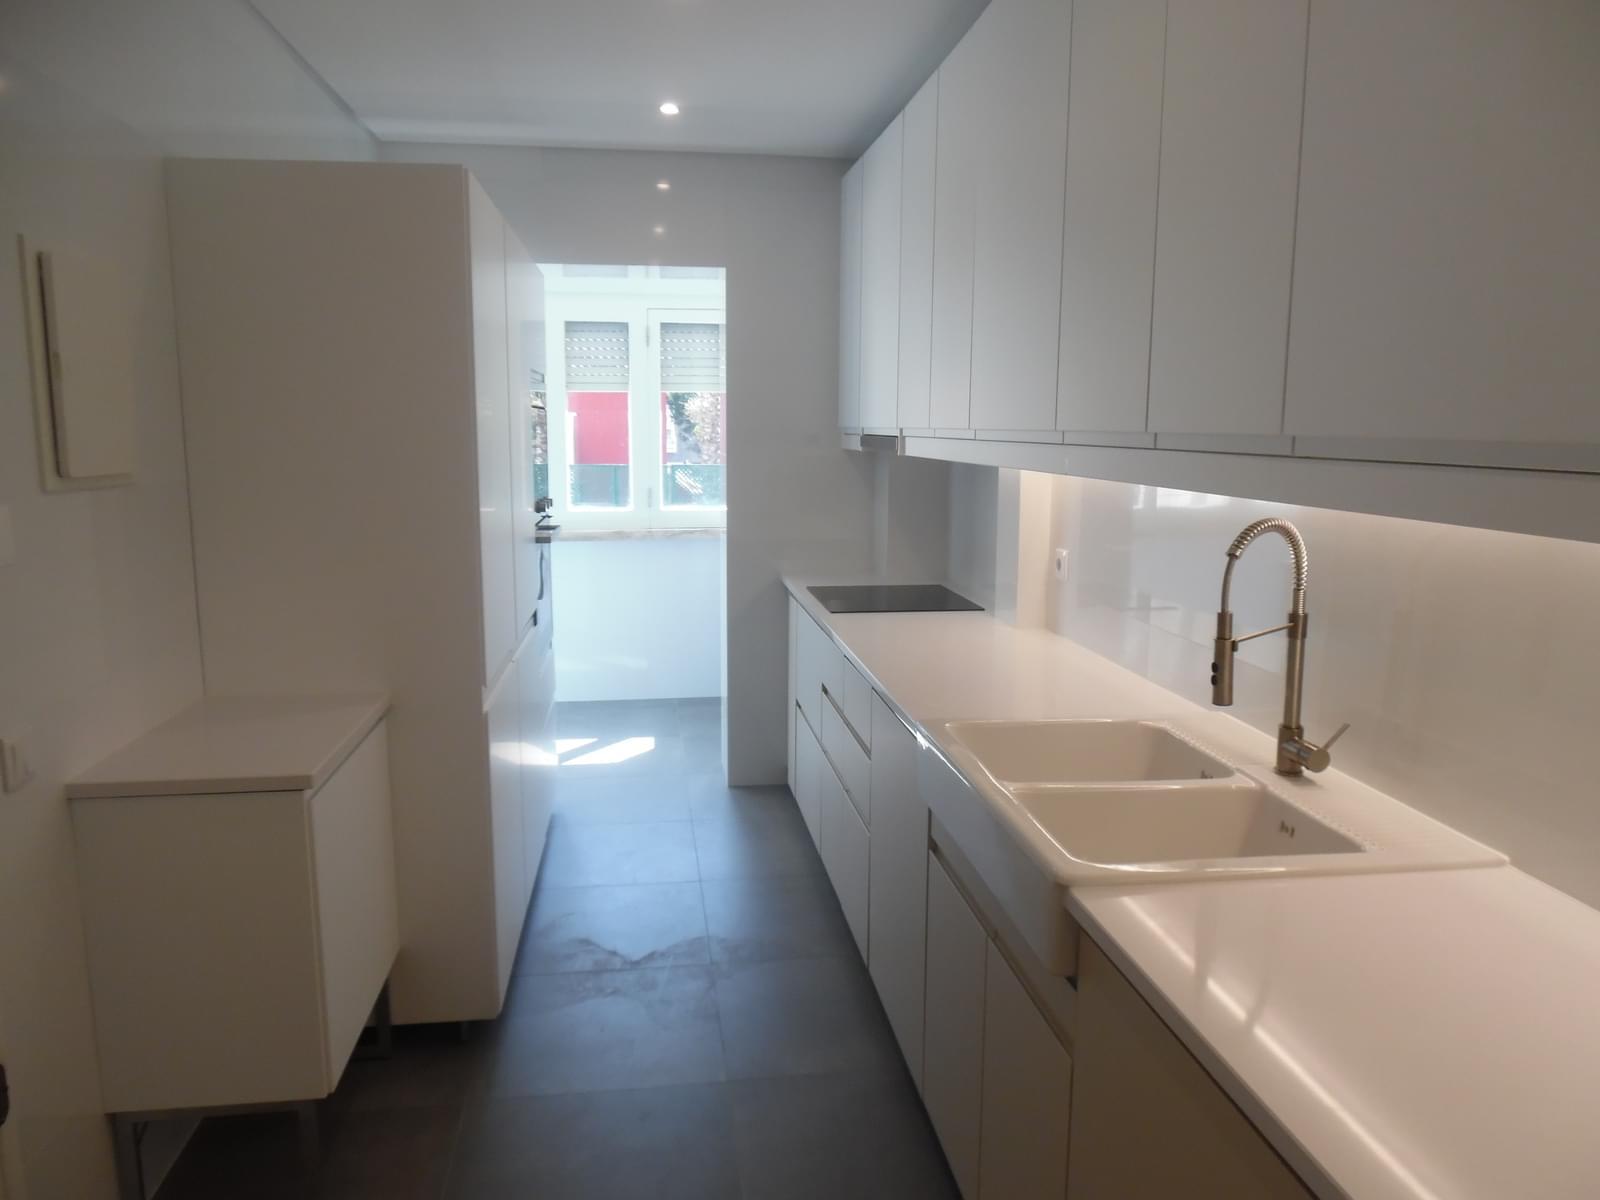 pf17621-apartamento-t4-lisboa-9b019ddd-bd85-40b5-93c9-f5efa45a1c62